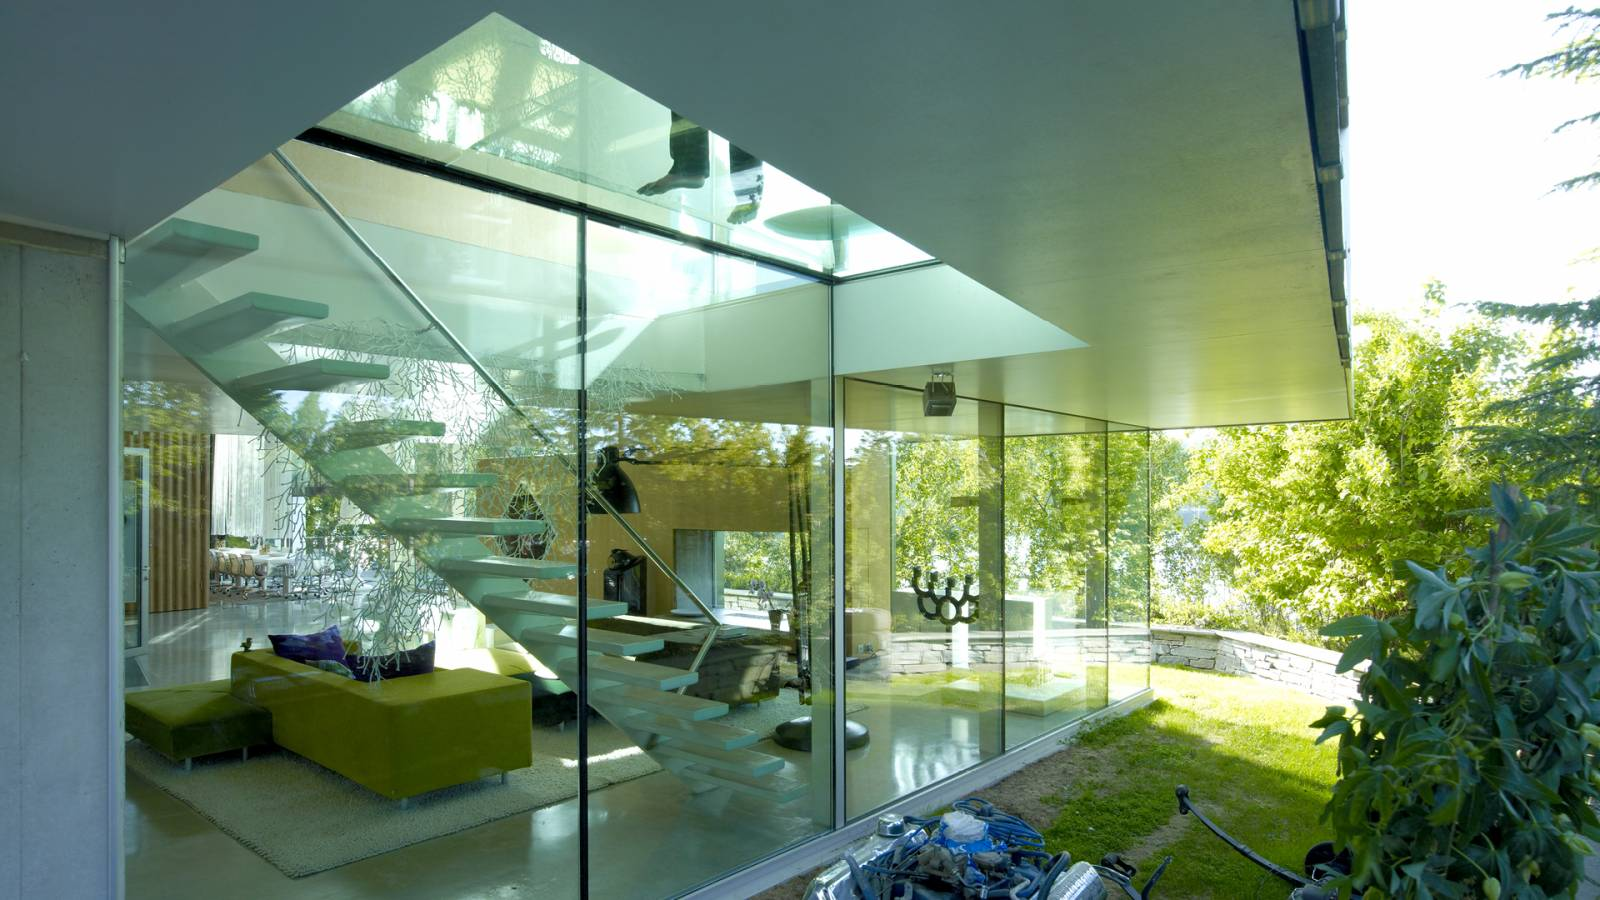 GARDEN VIEW - V-House - SPOL Architects